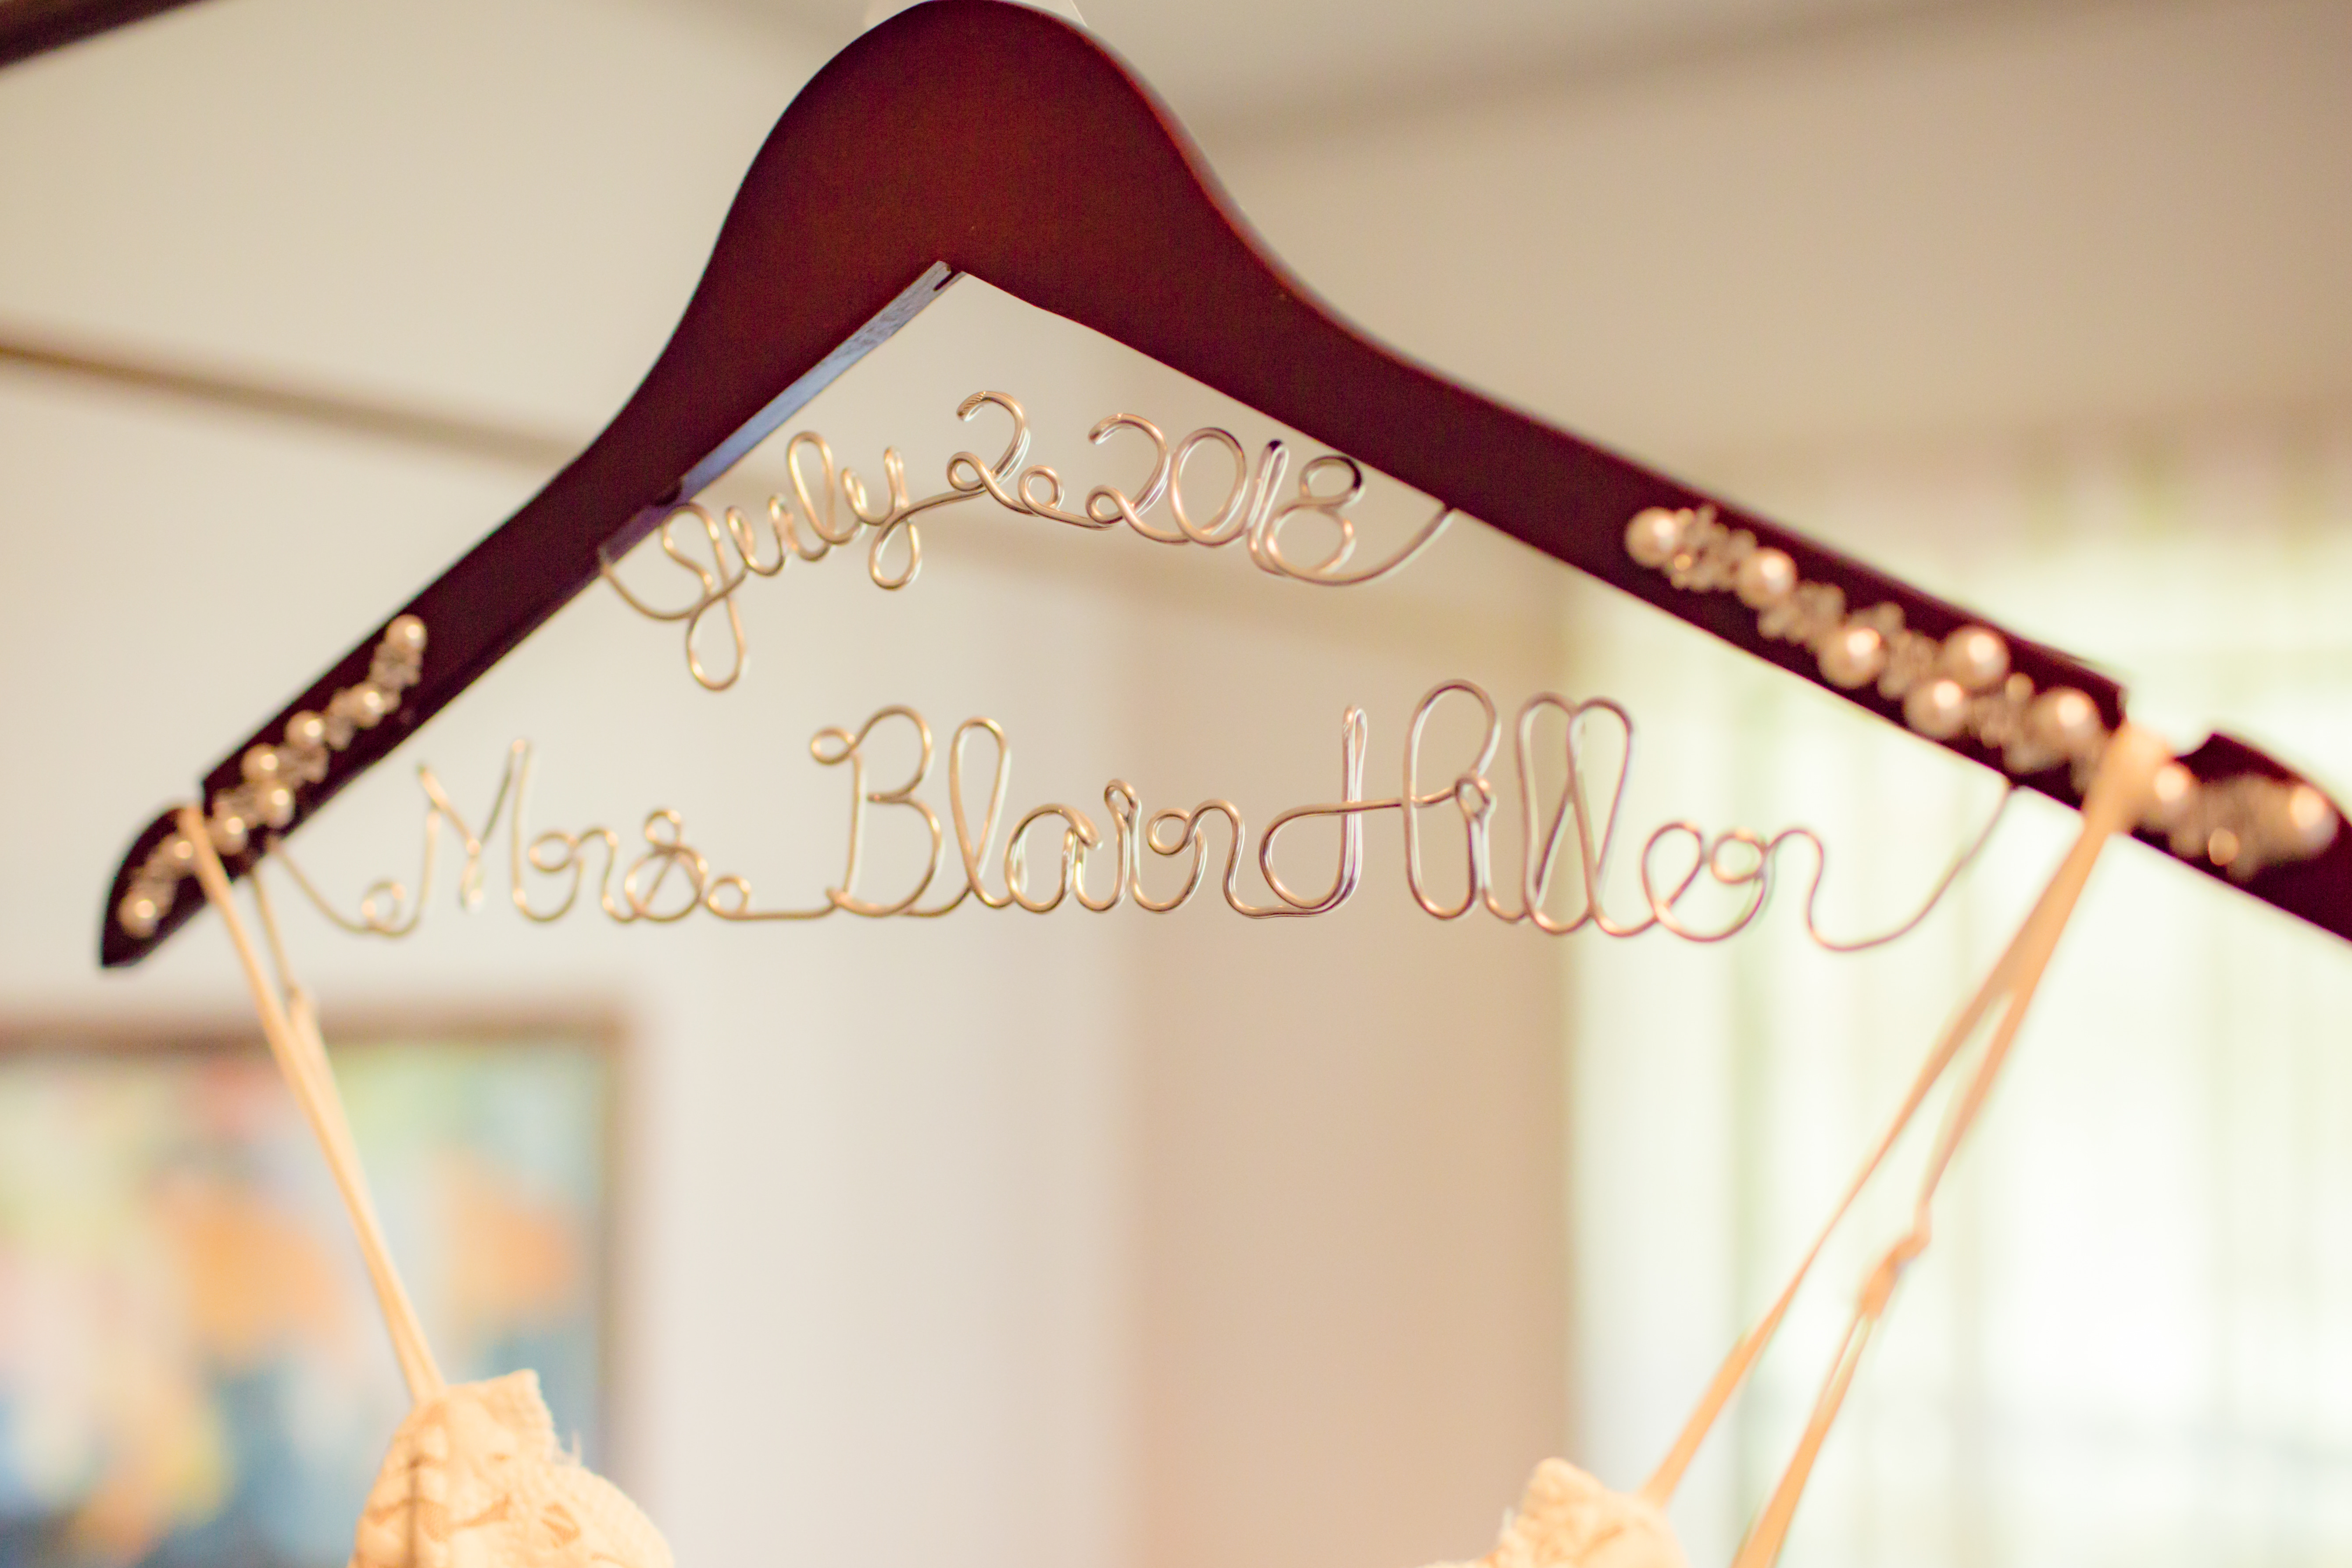 Wedding Gown Hanger | Destination Wedding in Maui | Maui Wedding Planner | Maui's Angels blog